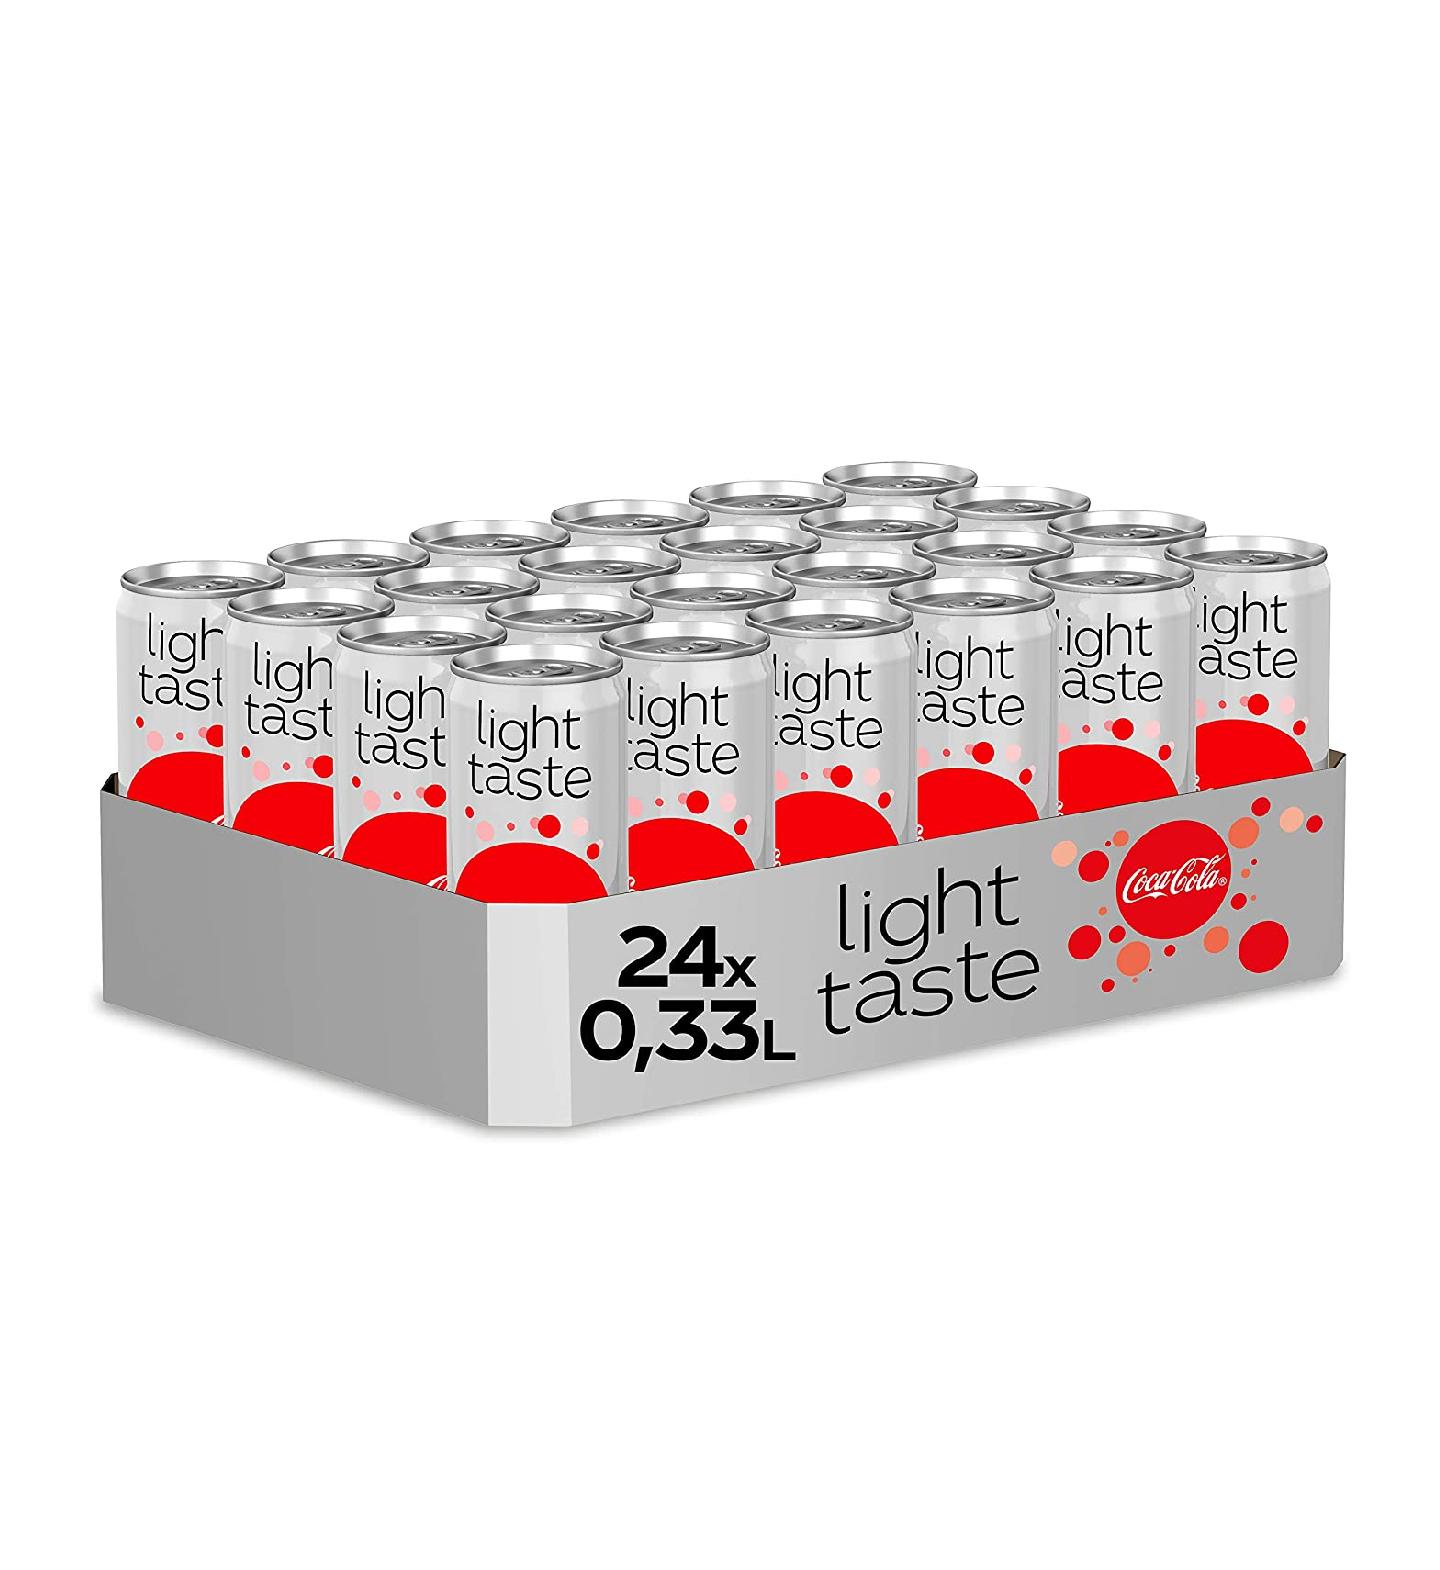 Coca-Cola Light Taste (24x 330ml)